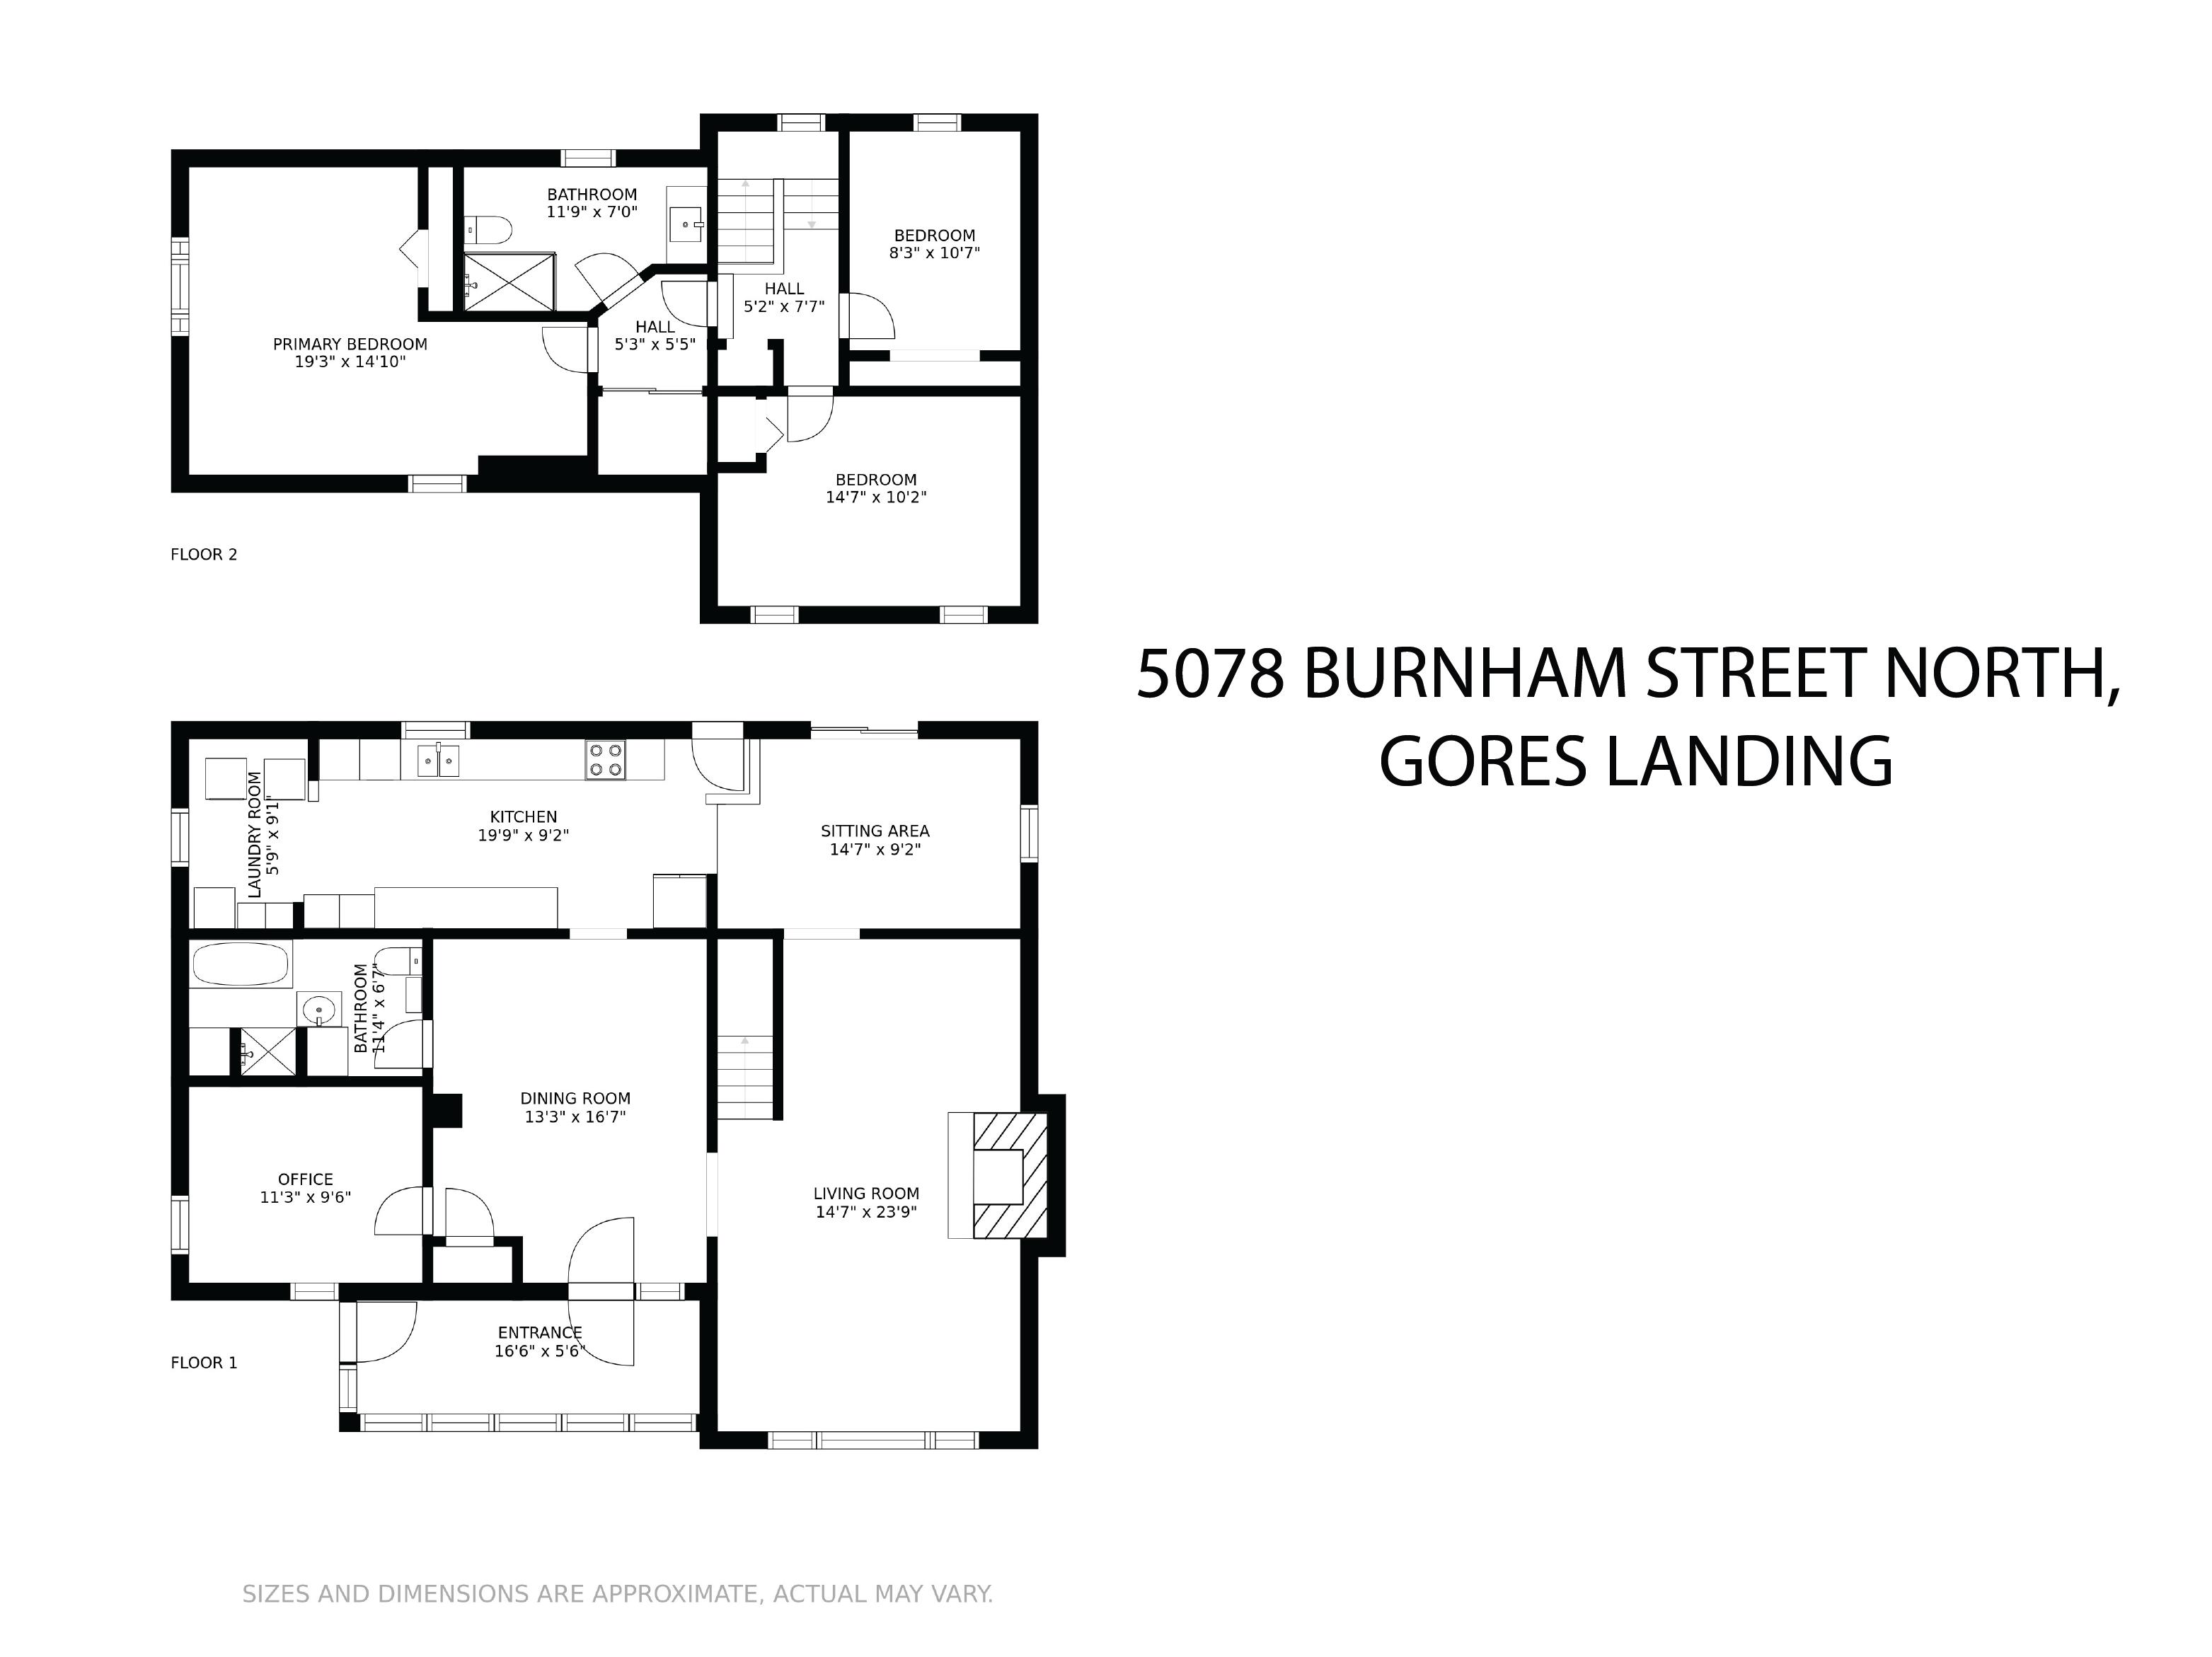 5078 Burnham Street N floorplan